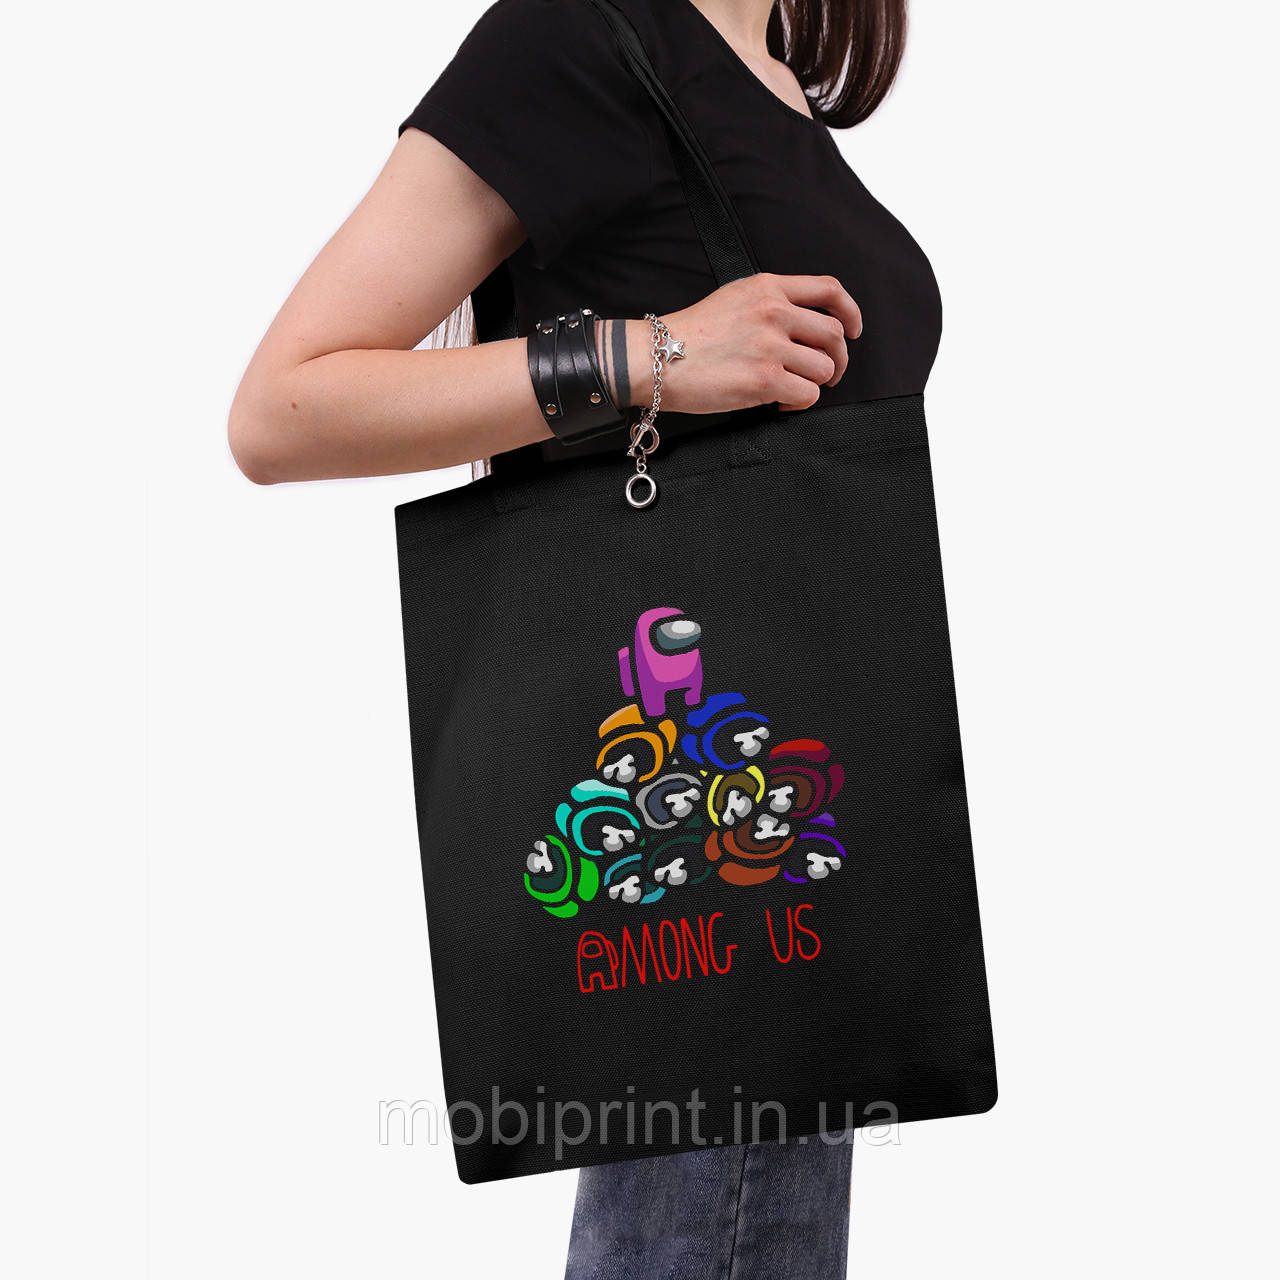 Еко сумка шоппер чорна Амонг Ас (Among Us) (9227-2594-2) 41*35 см